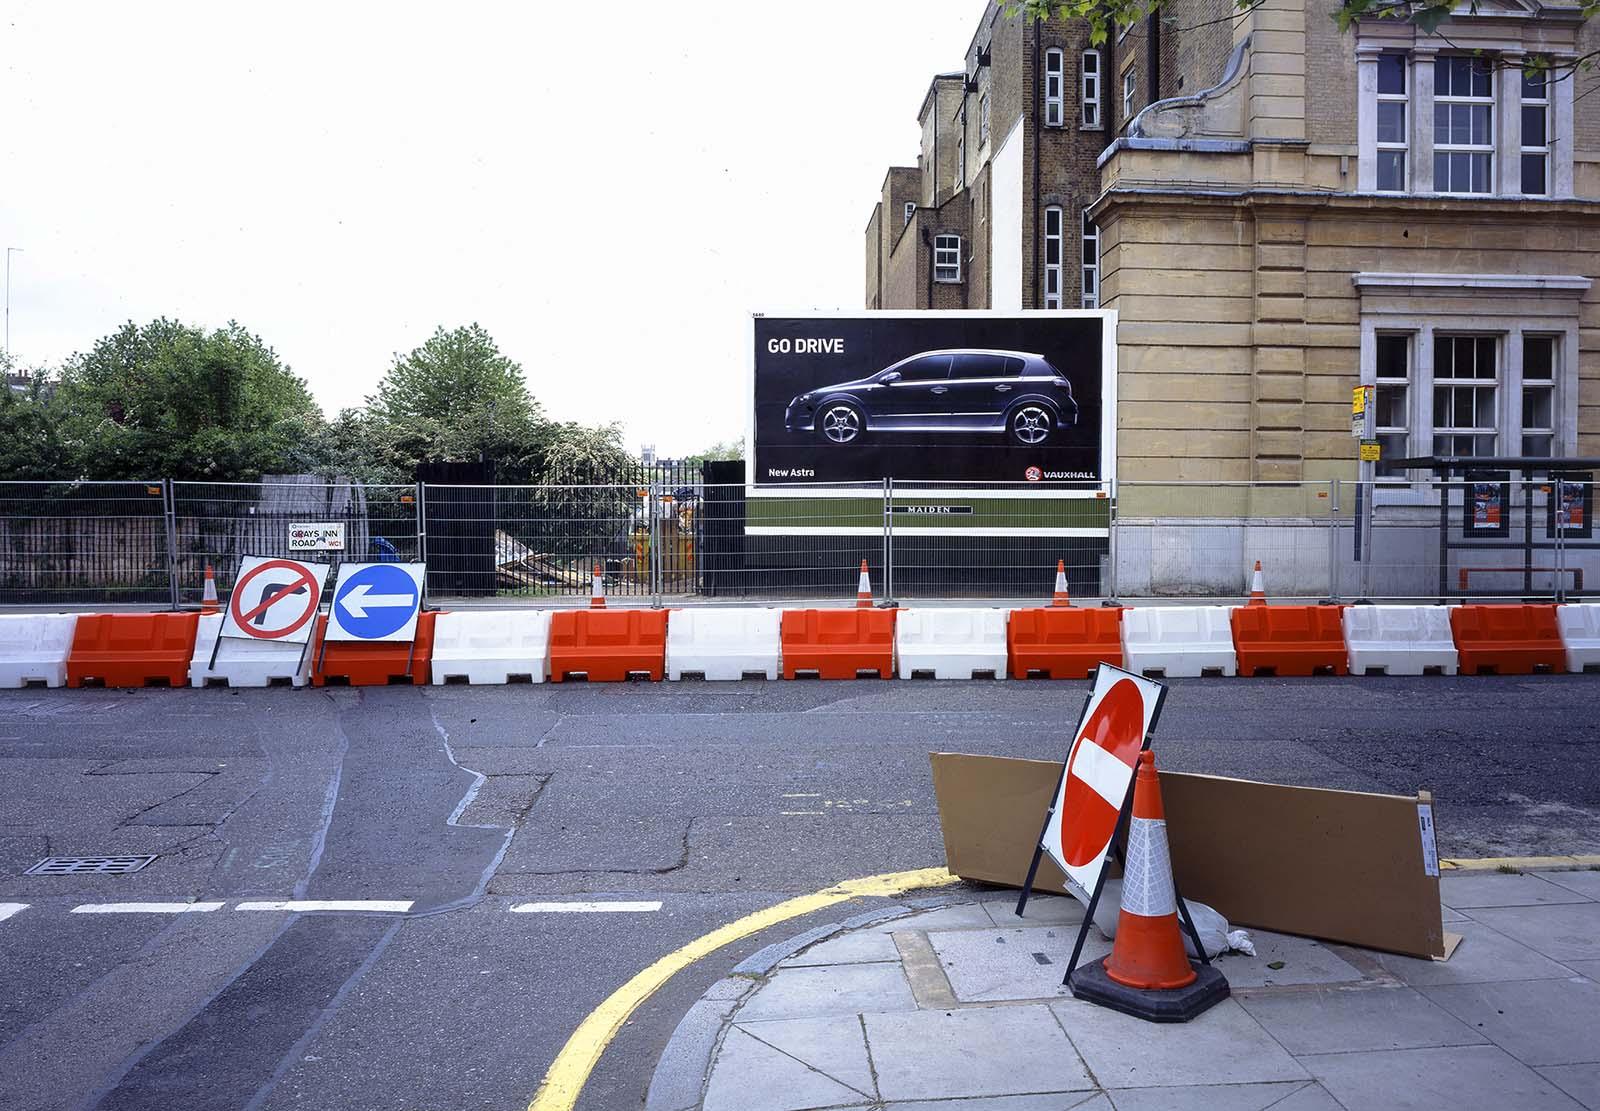 Go Drive, London UK